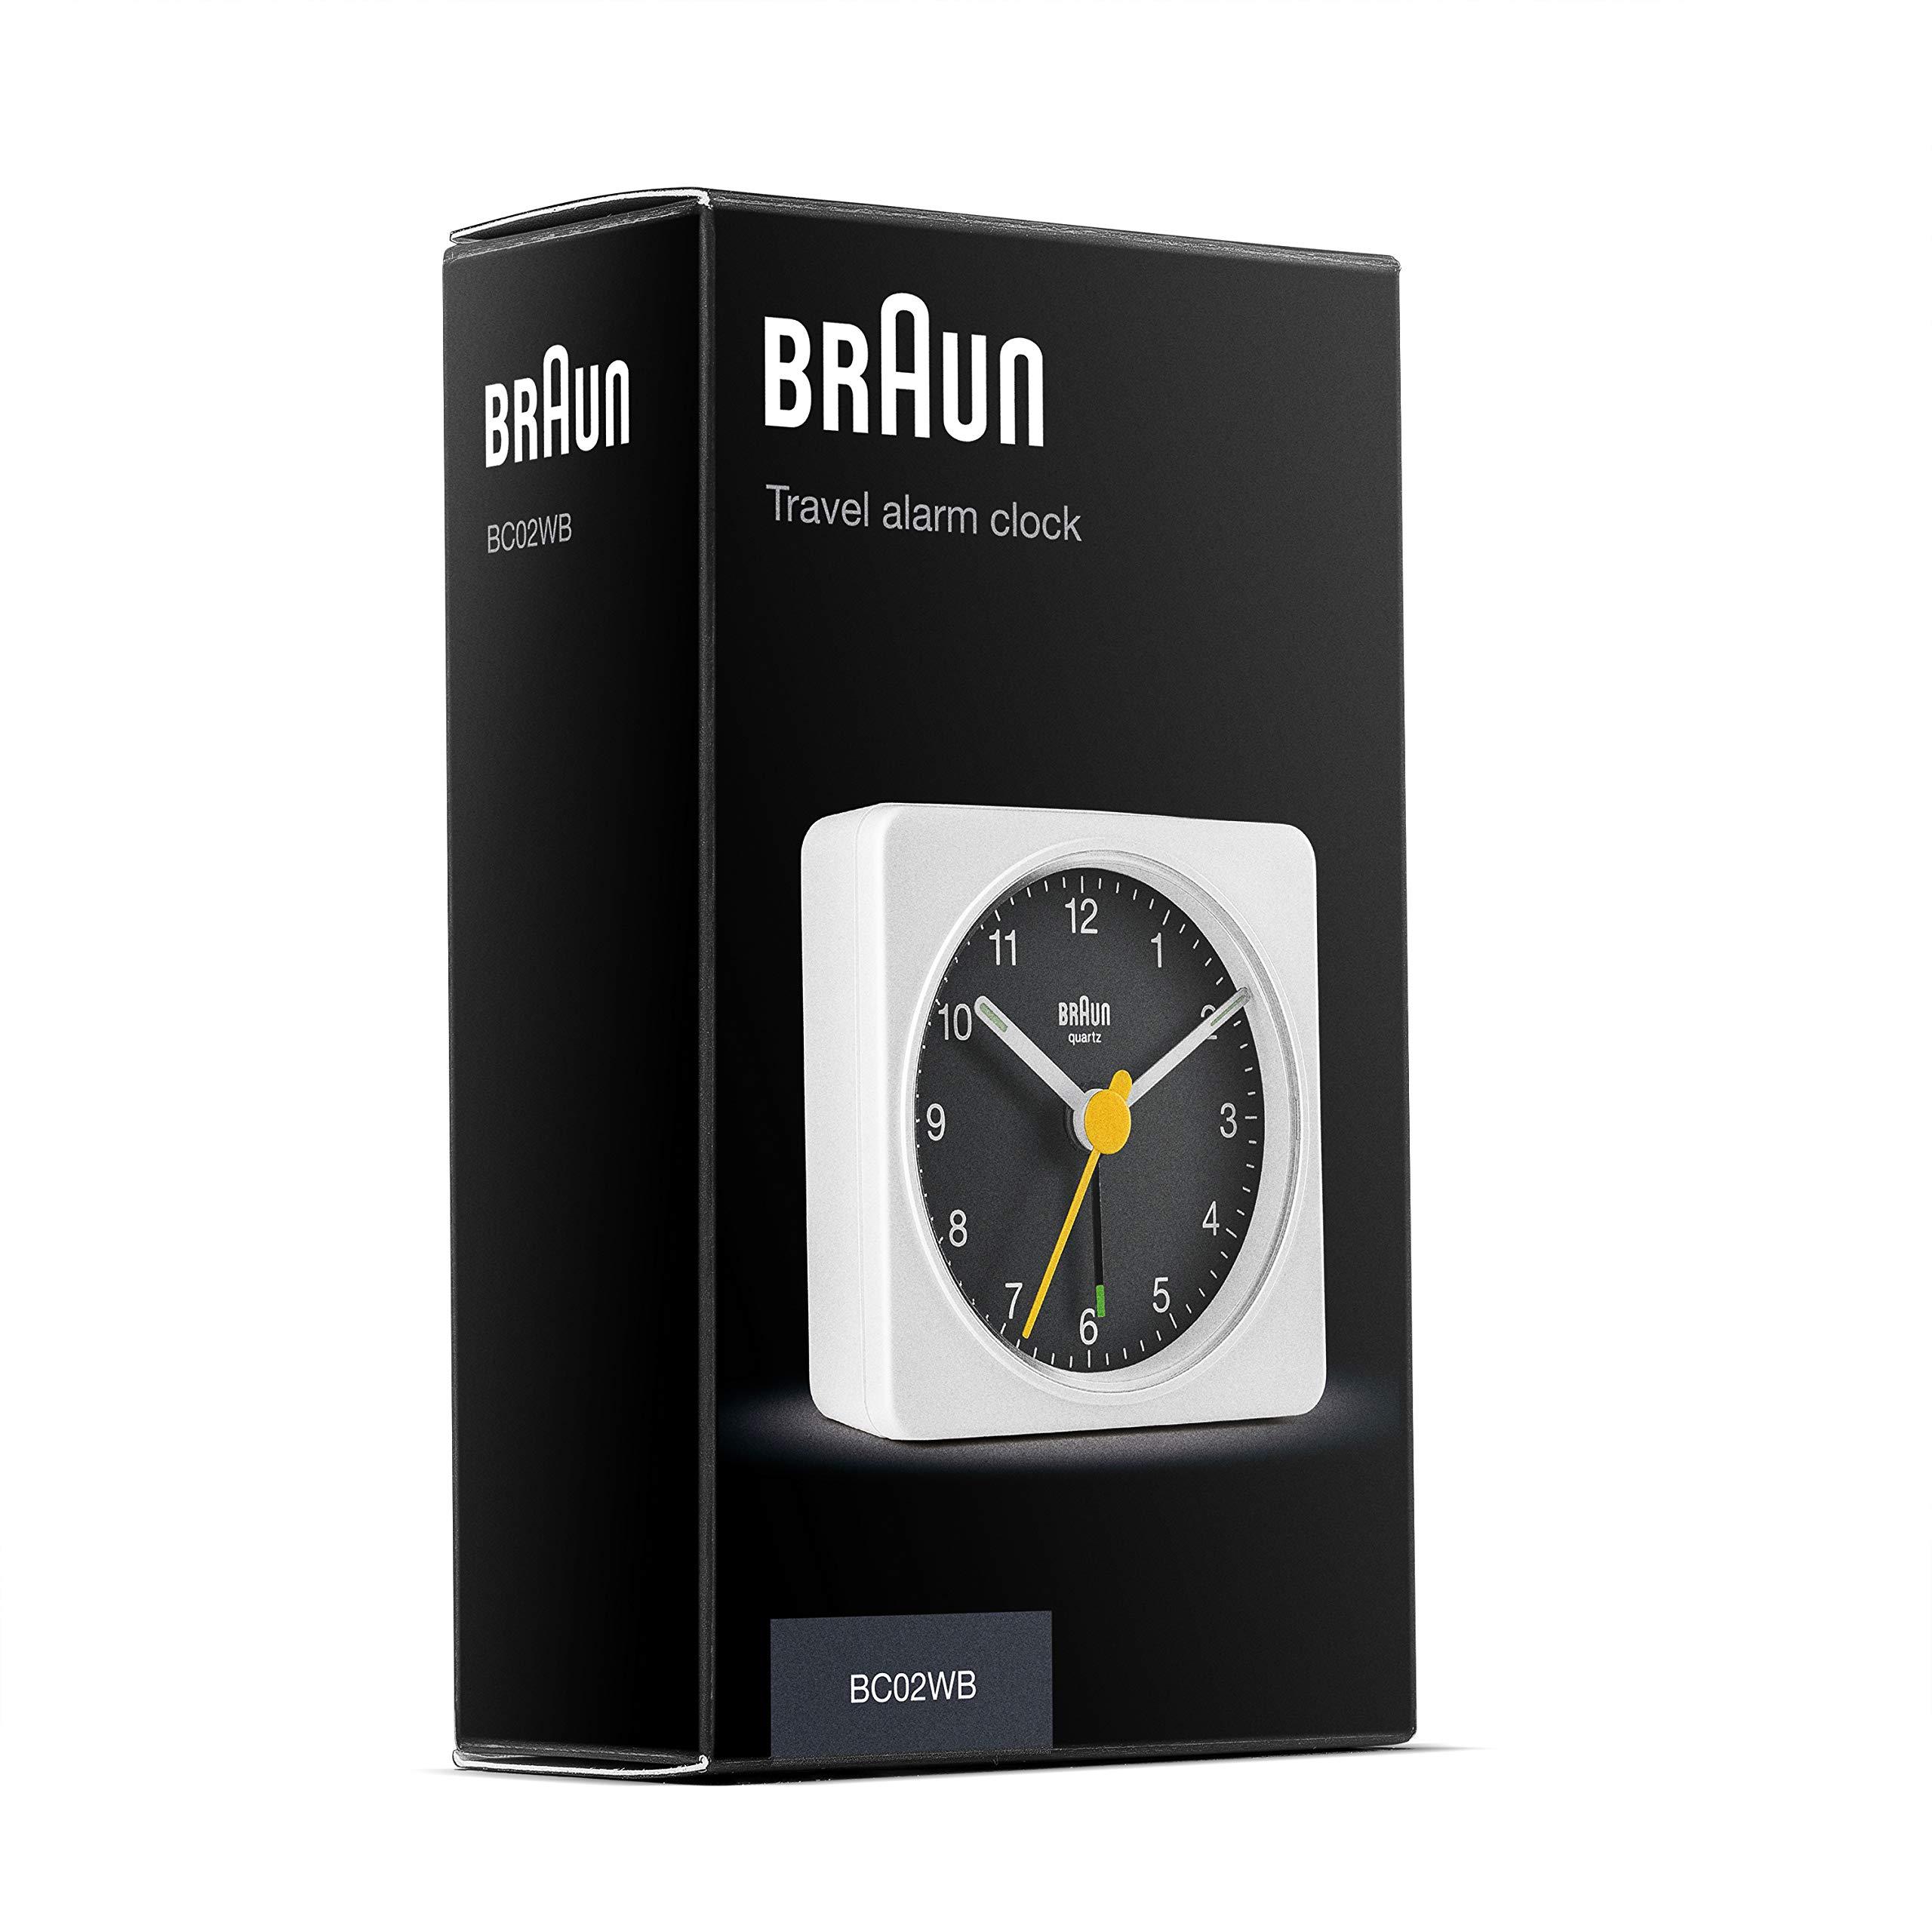 Braun Classic Travel Analogue Clock Compact Size Quiet Quartz Movement Model BC02WB Crescendo Beep Alarm in White and Black